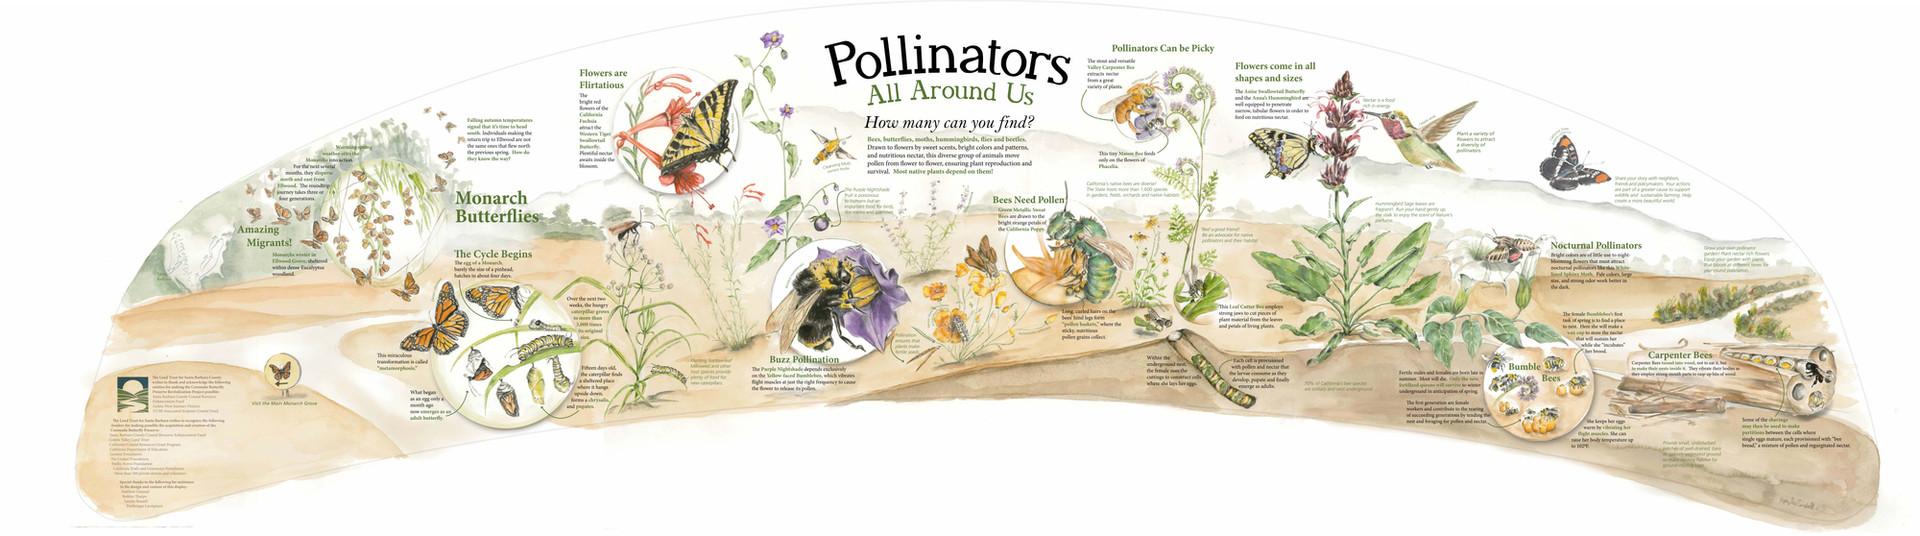 Pollinators All Around Us